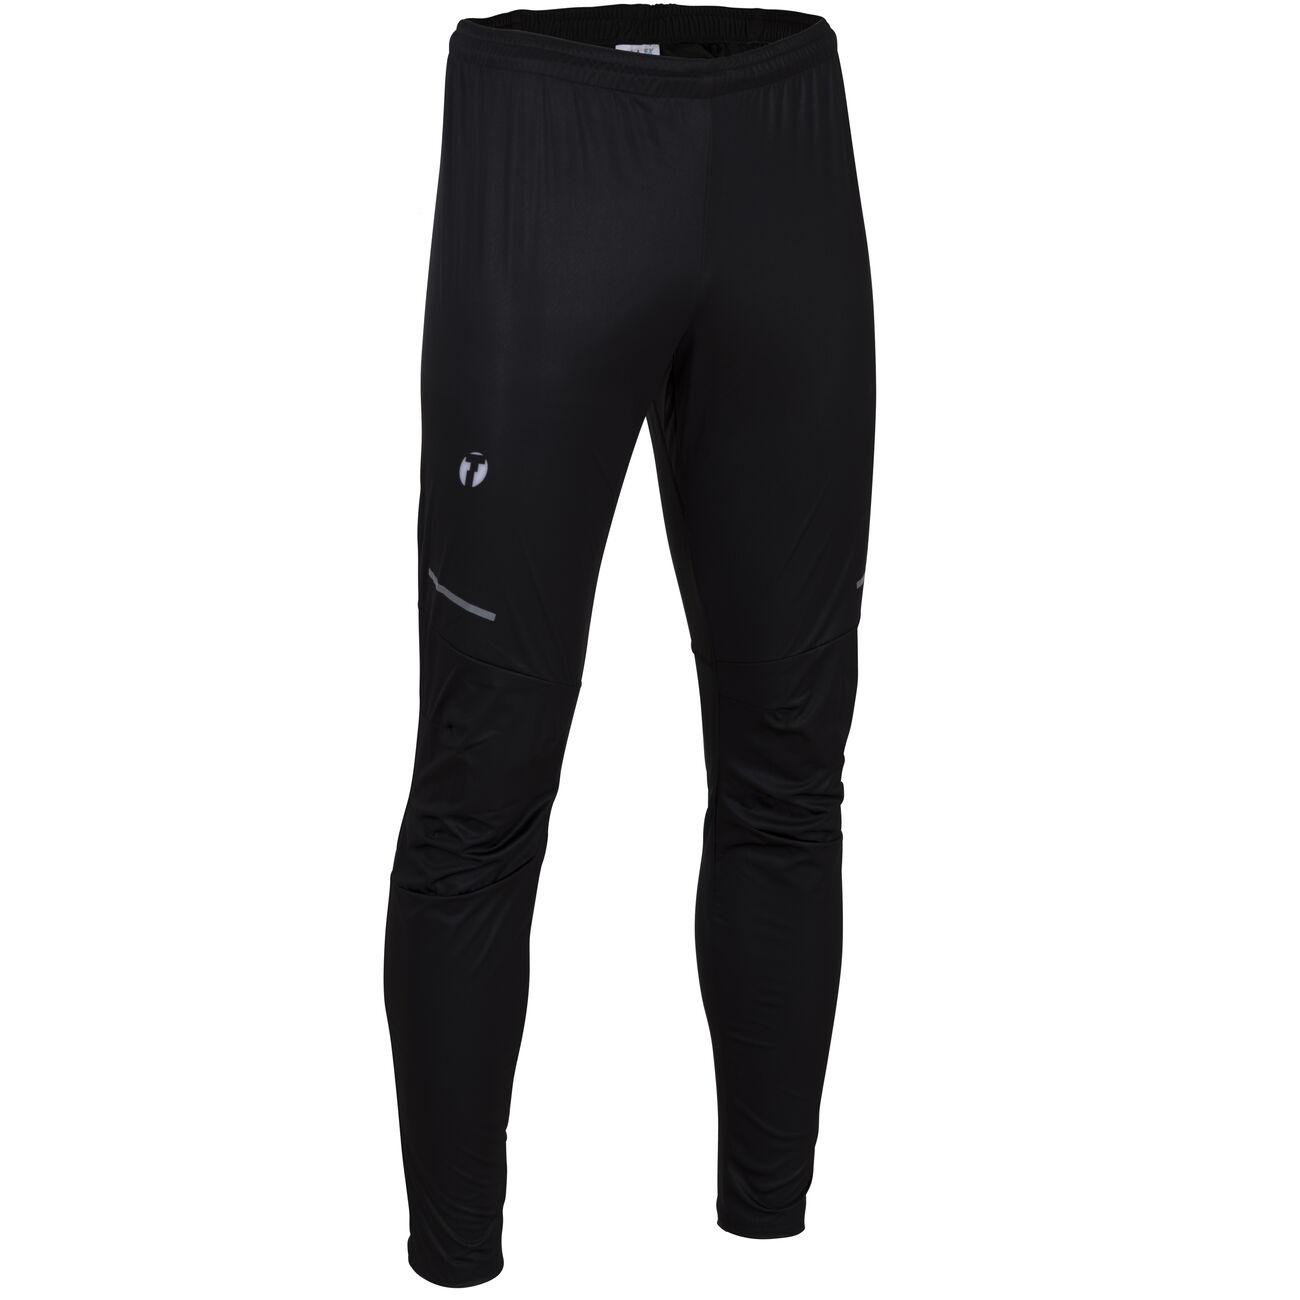 Instinct 2.0 running pants men's